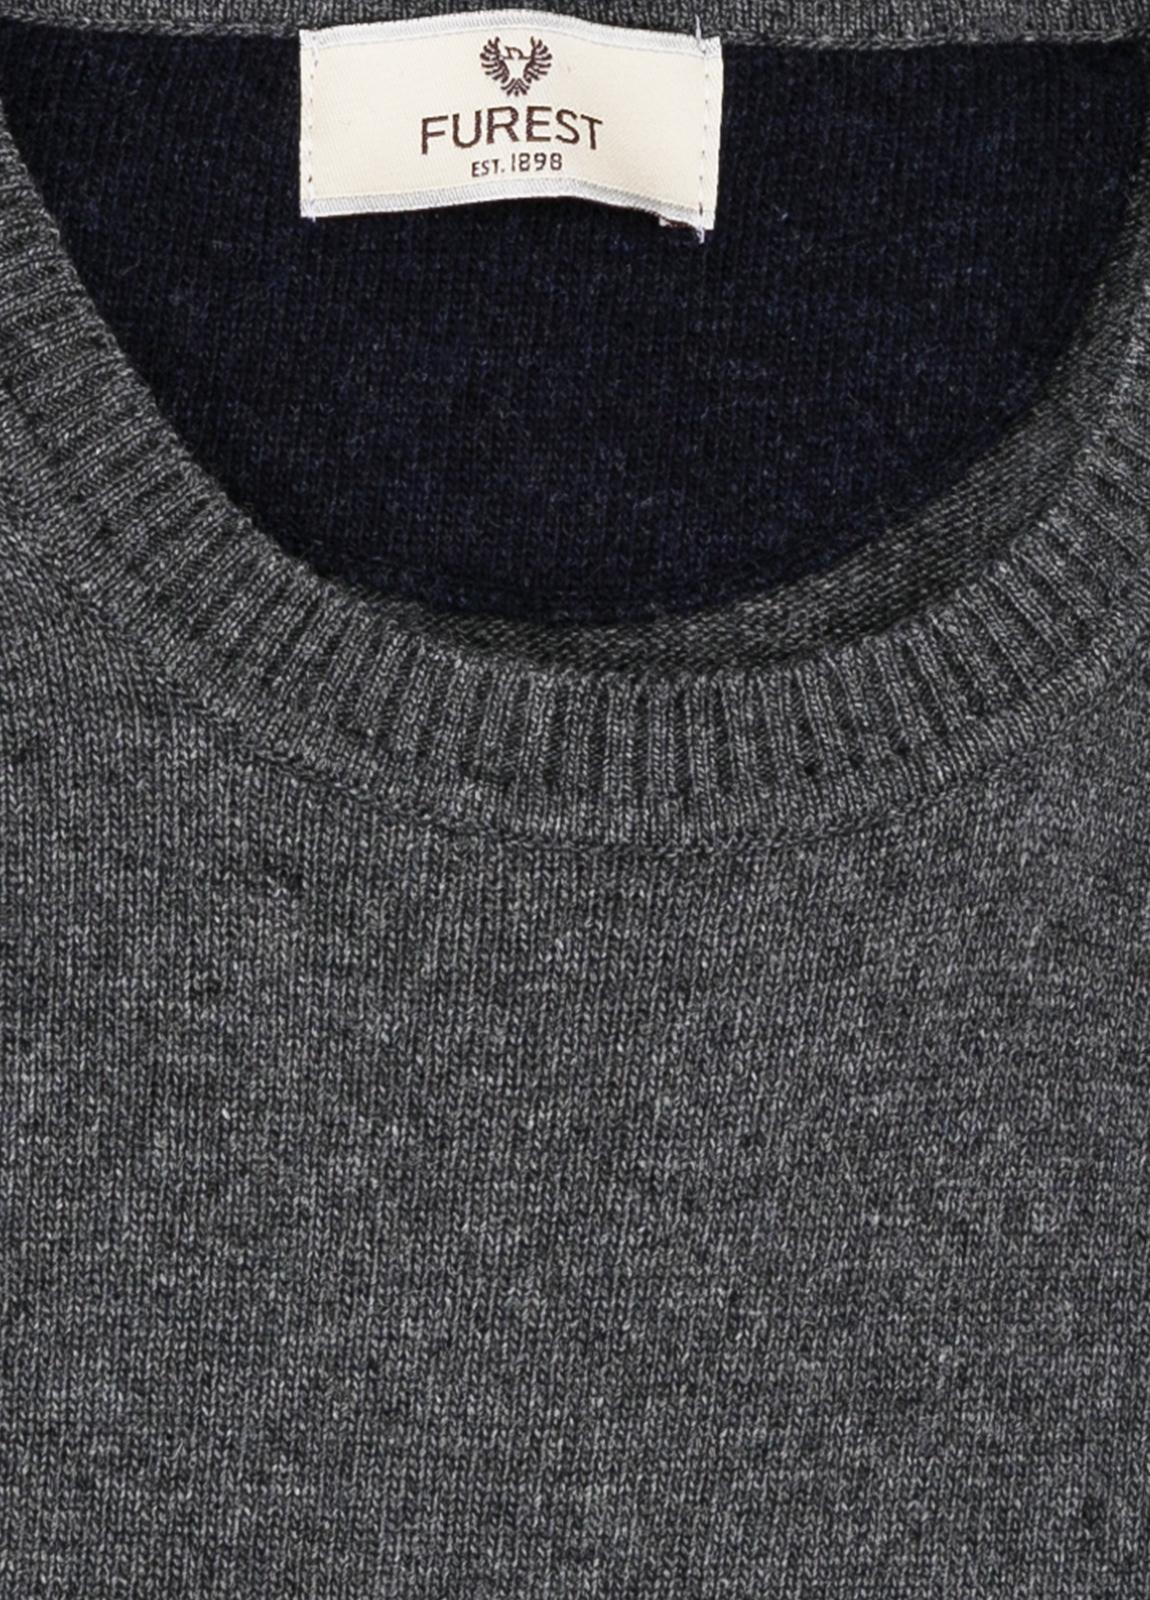 Jersey liso cuello redondo color gris vigoré, 40% lana merino, 20% viscosa, 10% cachemire